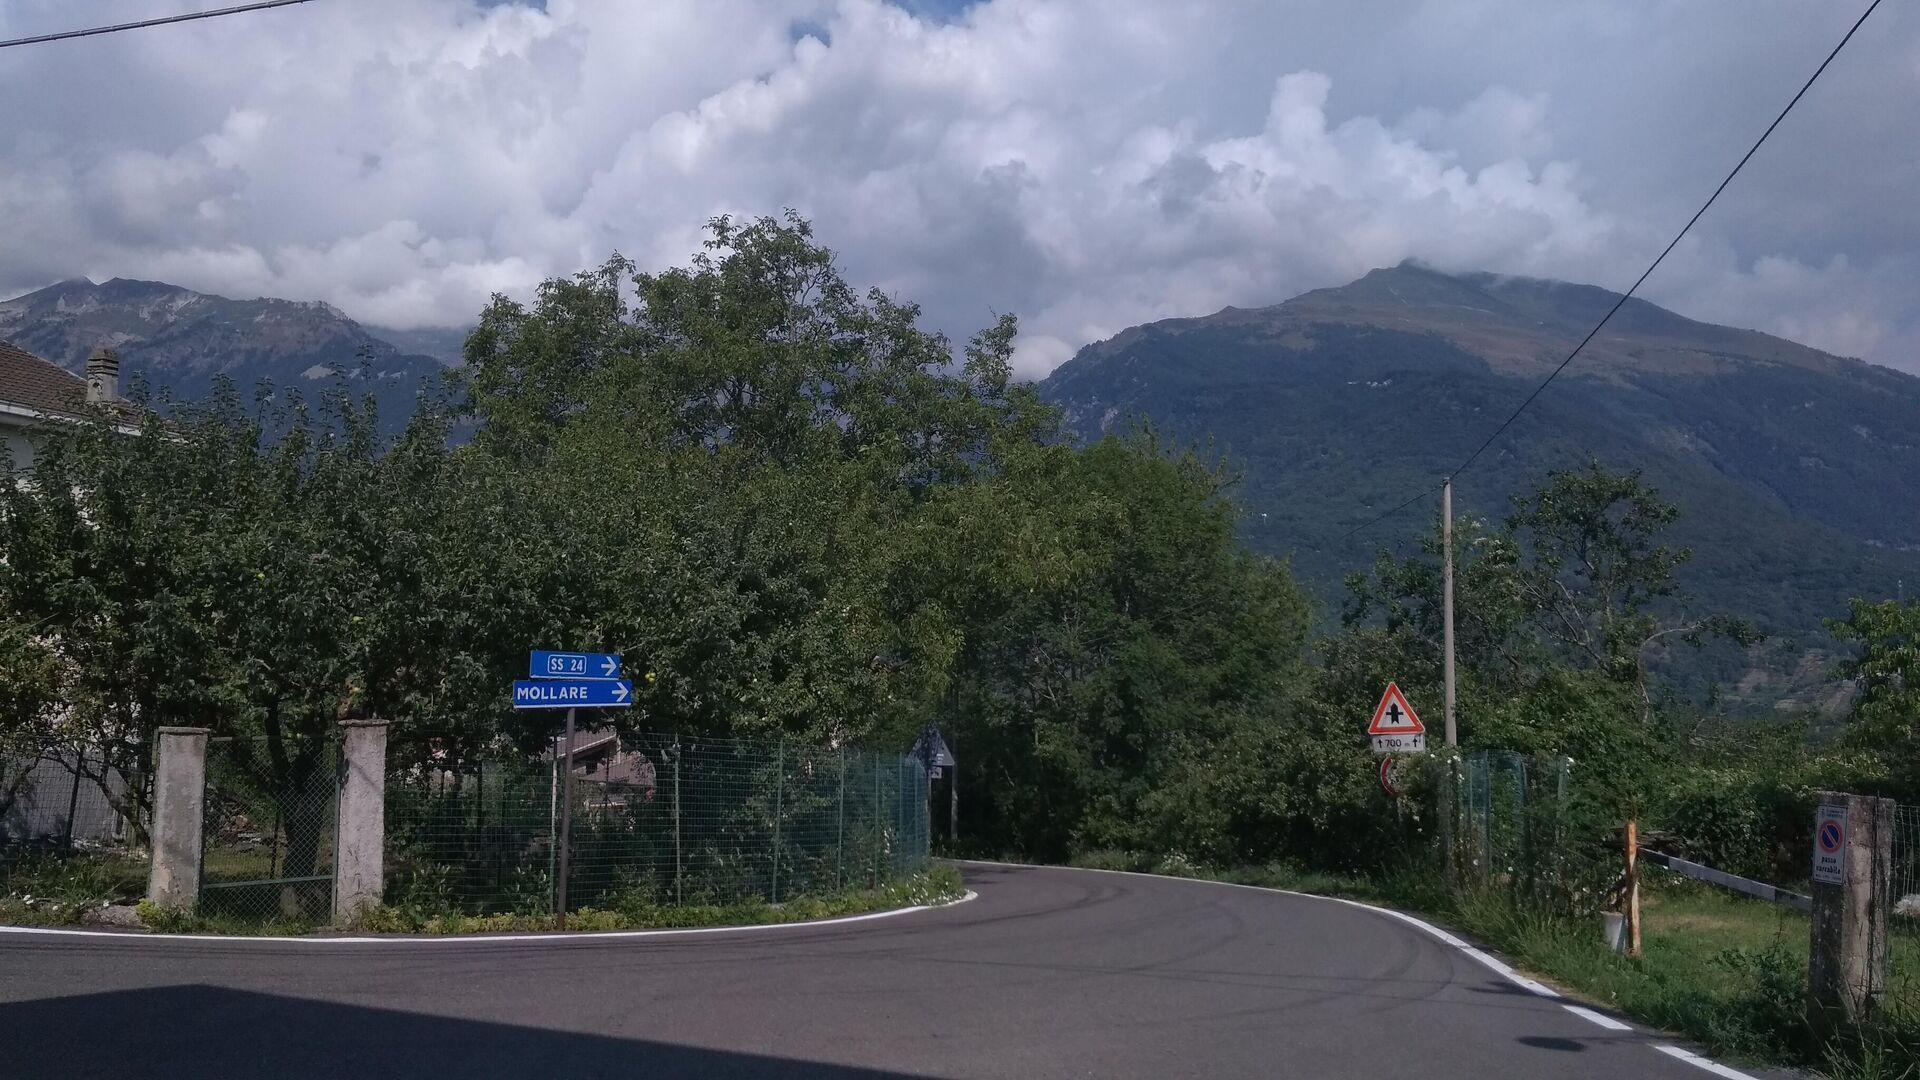 Strada in Val di Susa - Sputnik Italia, 1920, 19.05.2021